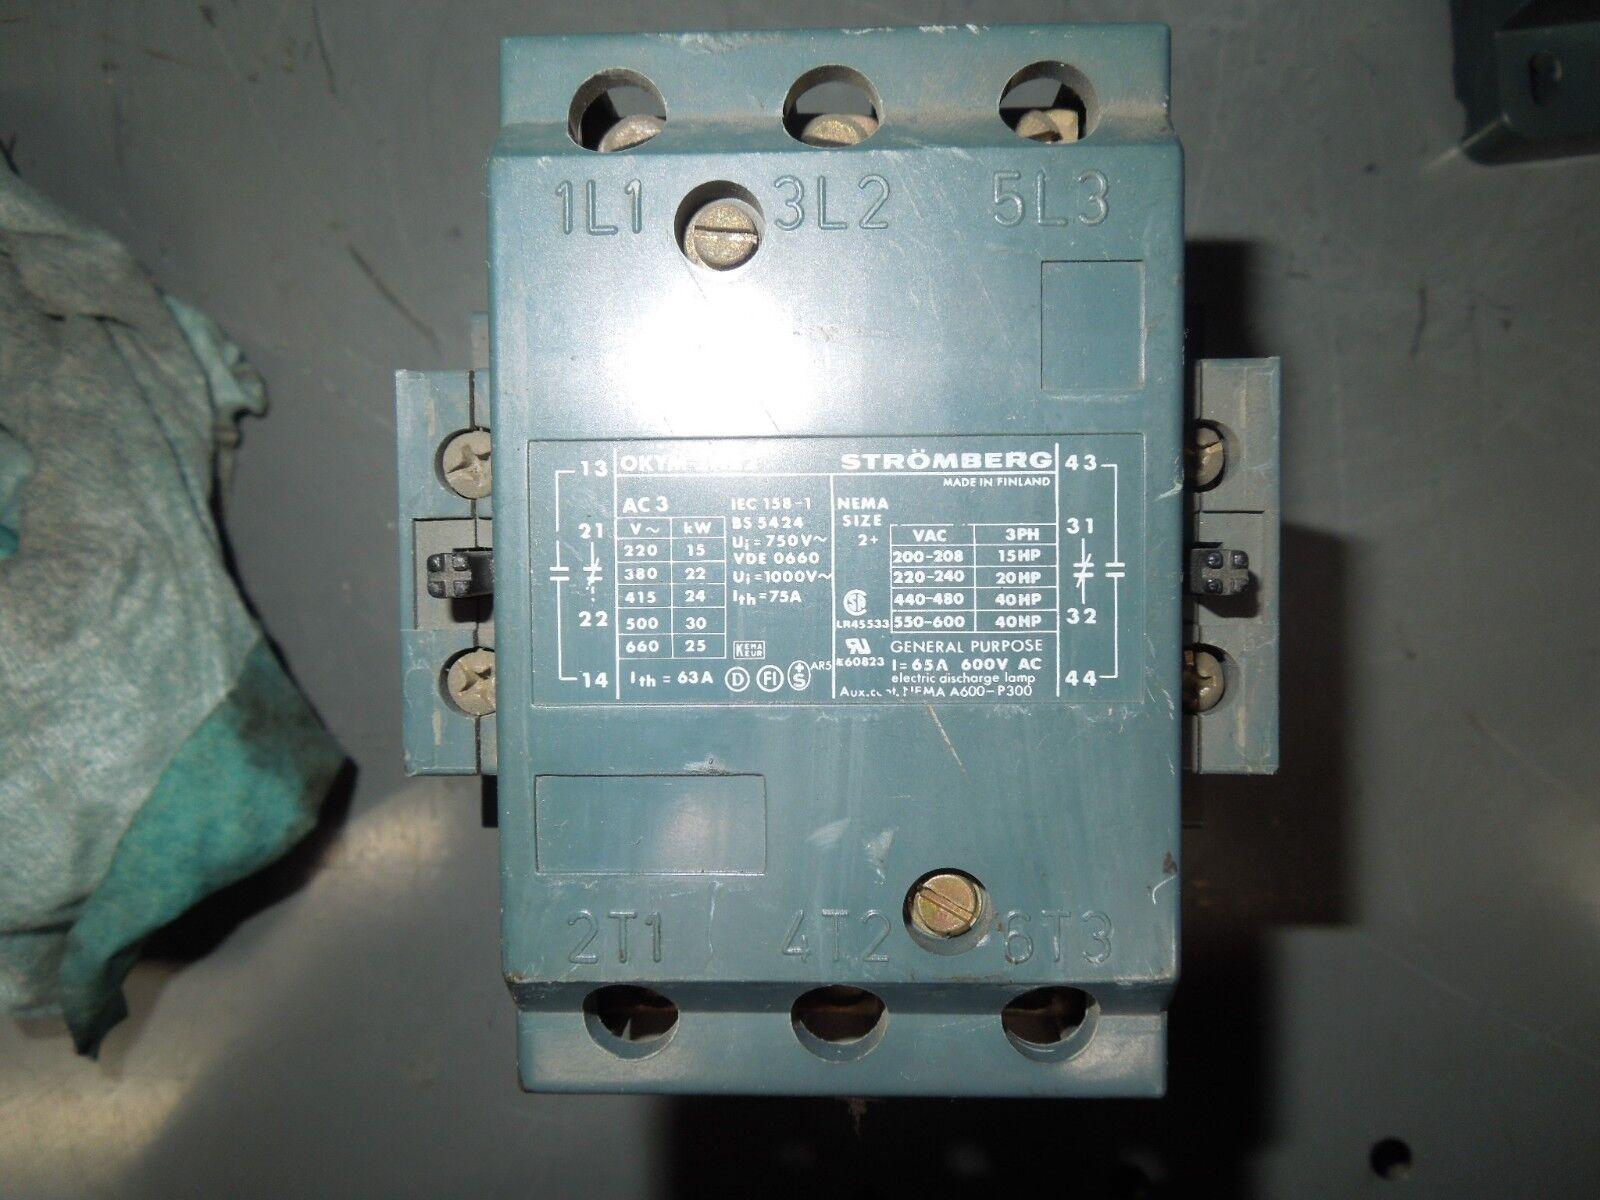 Stromberg OKYM 2 W 22 2W22 Size 2 Contactor 65 A 600 V 3 Phase 40 HP 240 V Coil